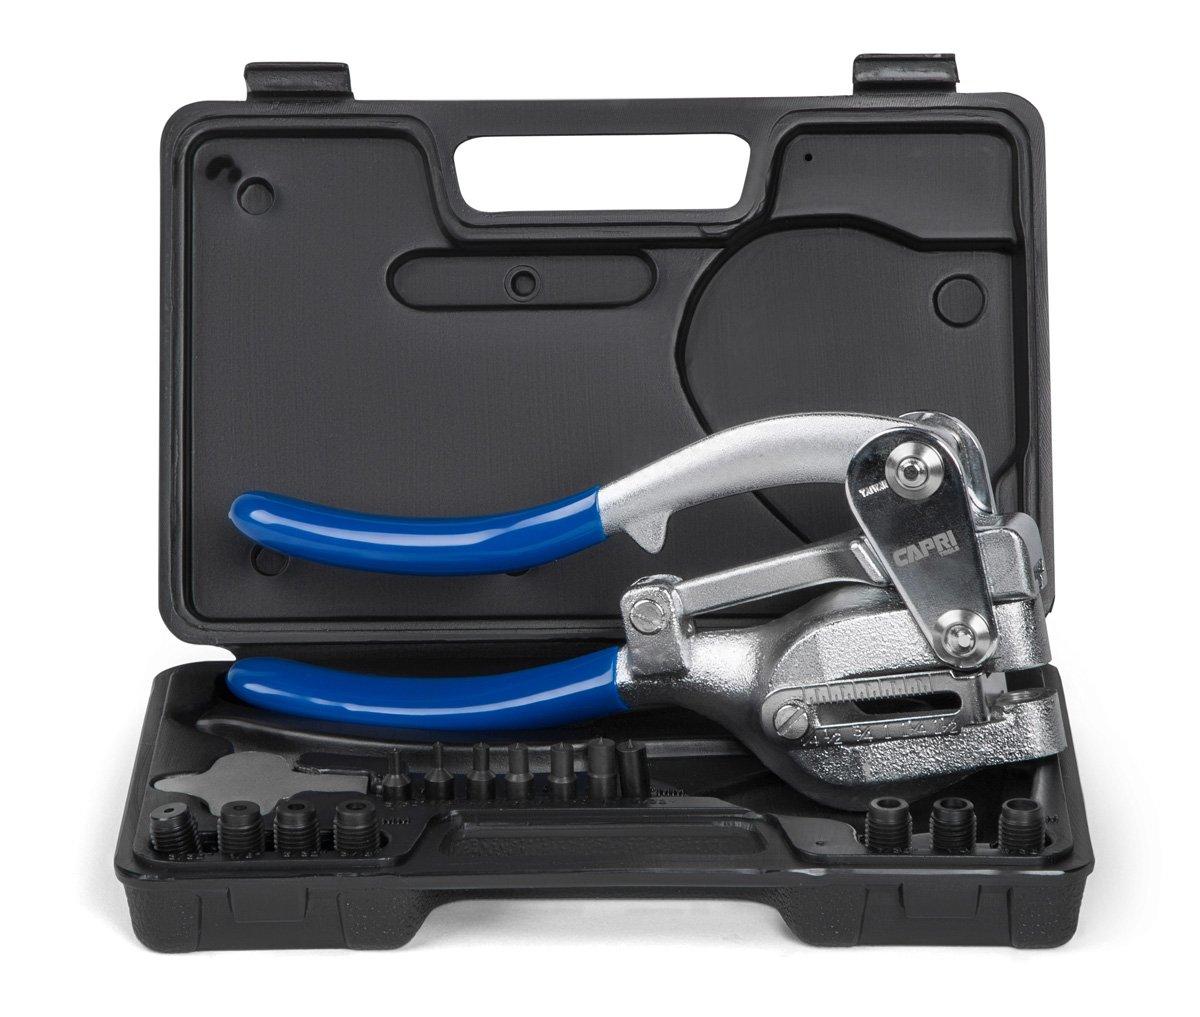 Capri Tools CP21050 21050 Puncher